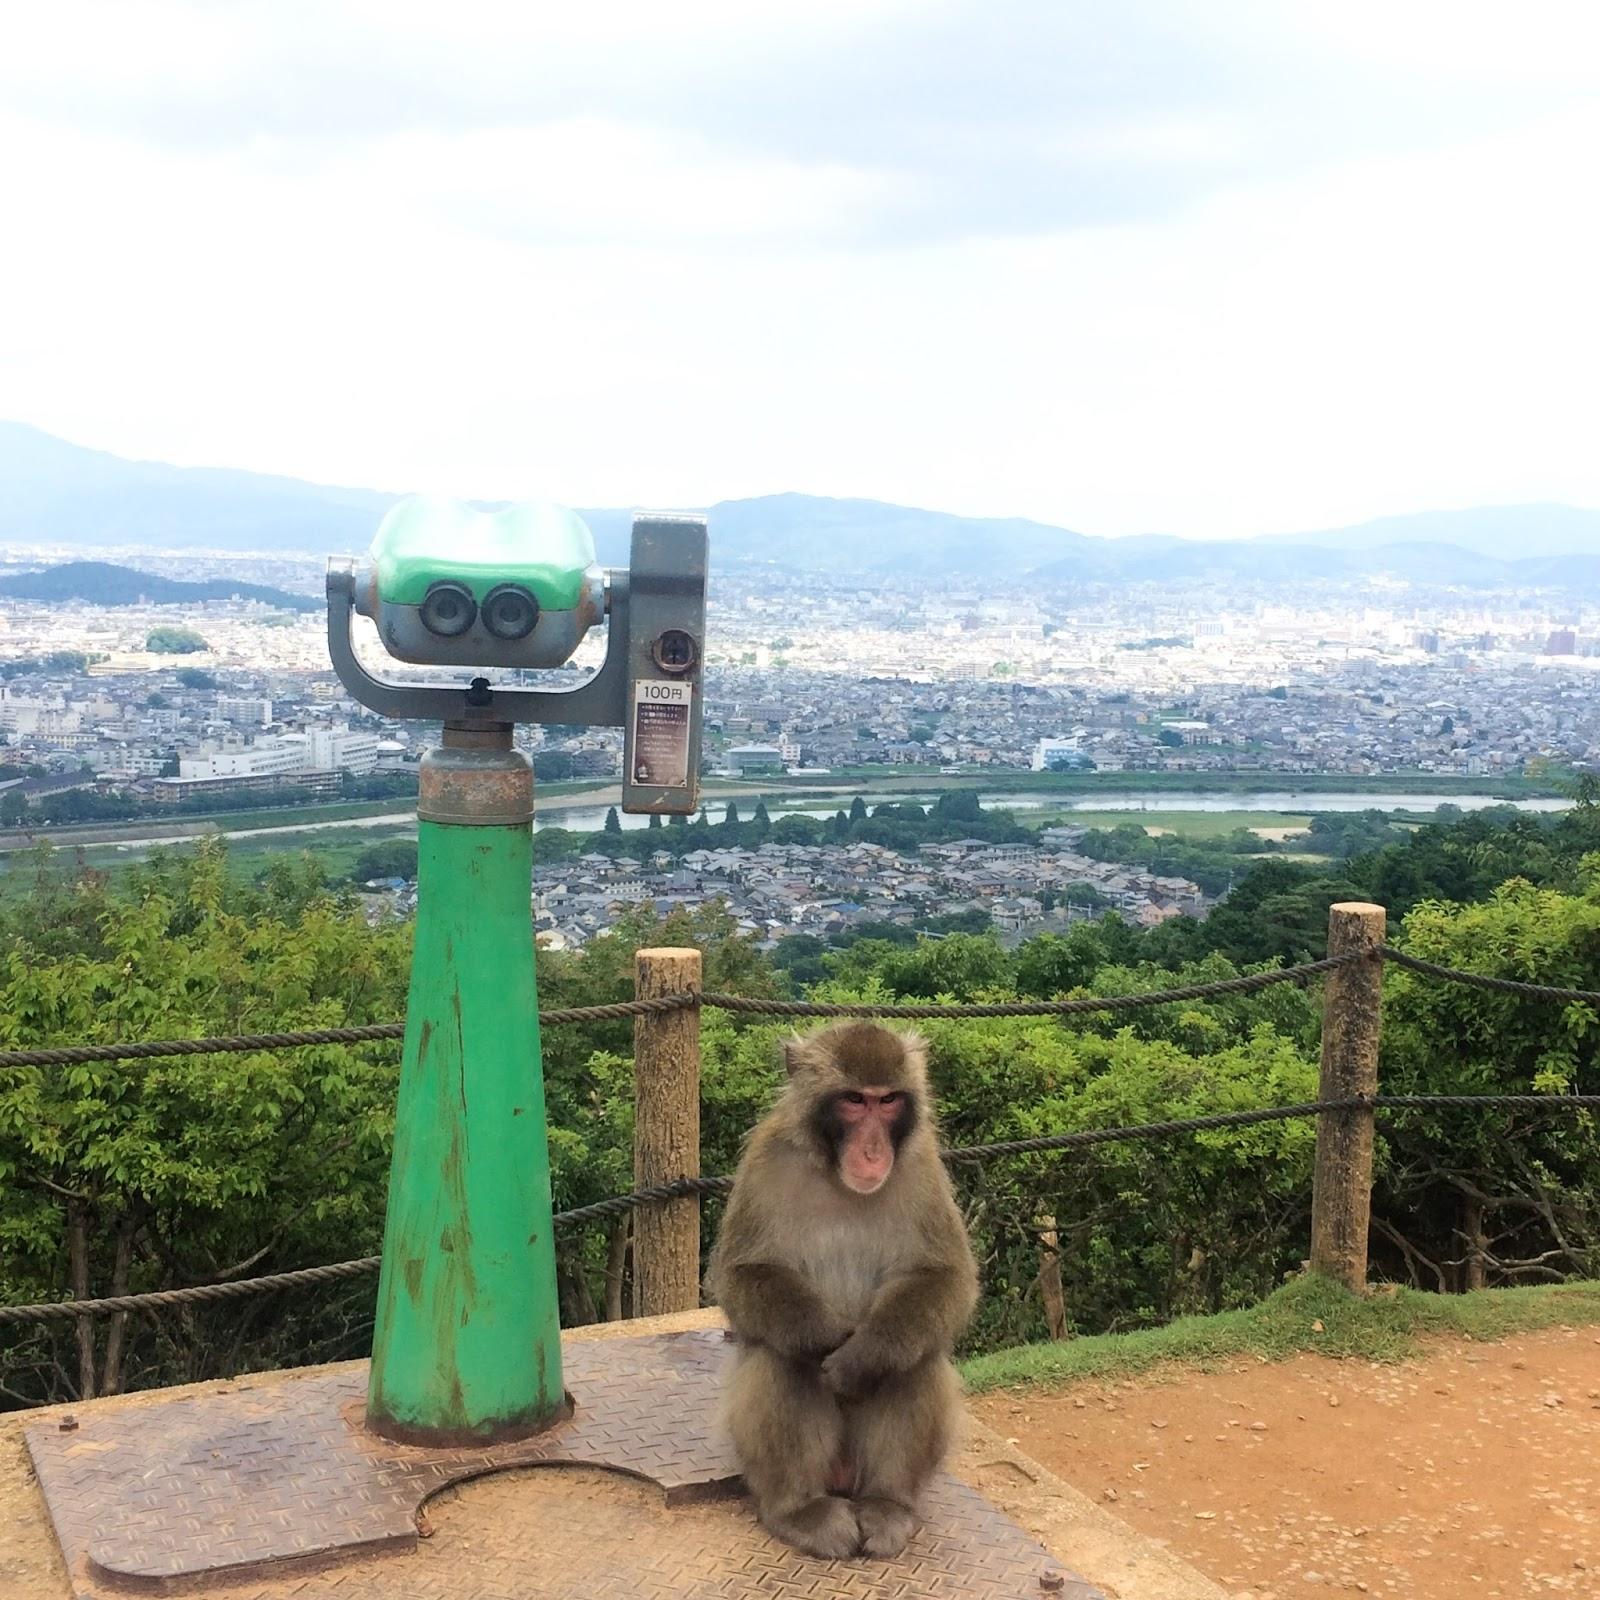 Iwatayama Monkey Park - A Make Believe World